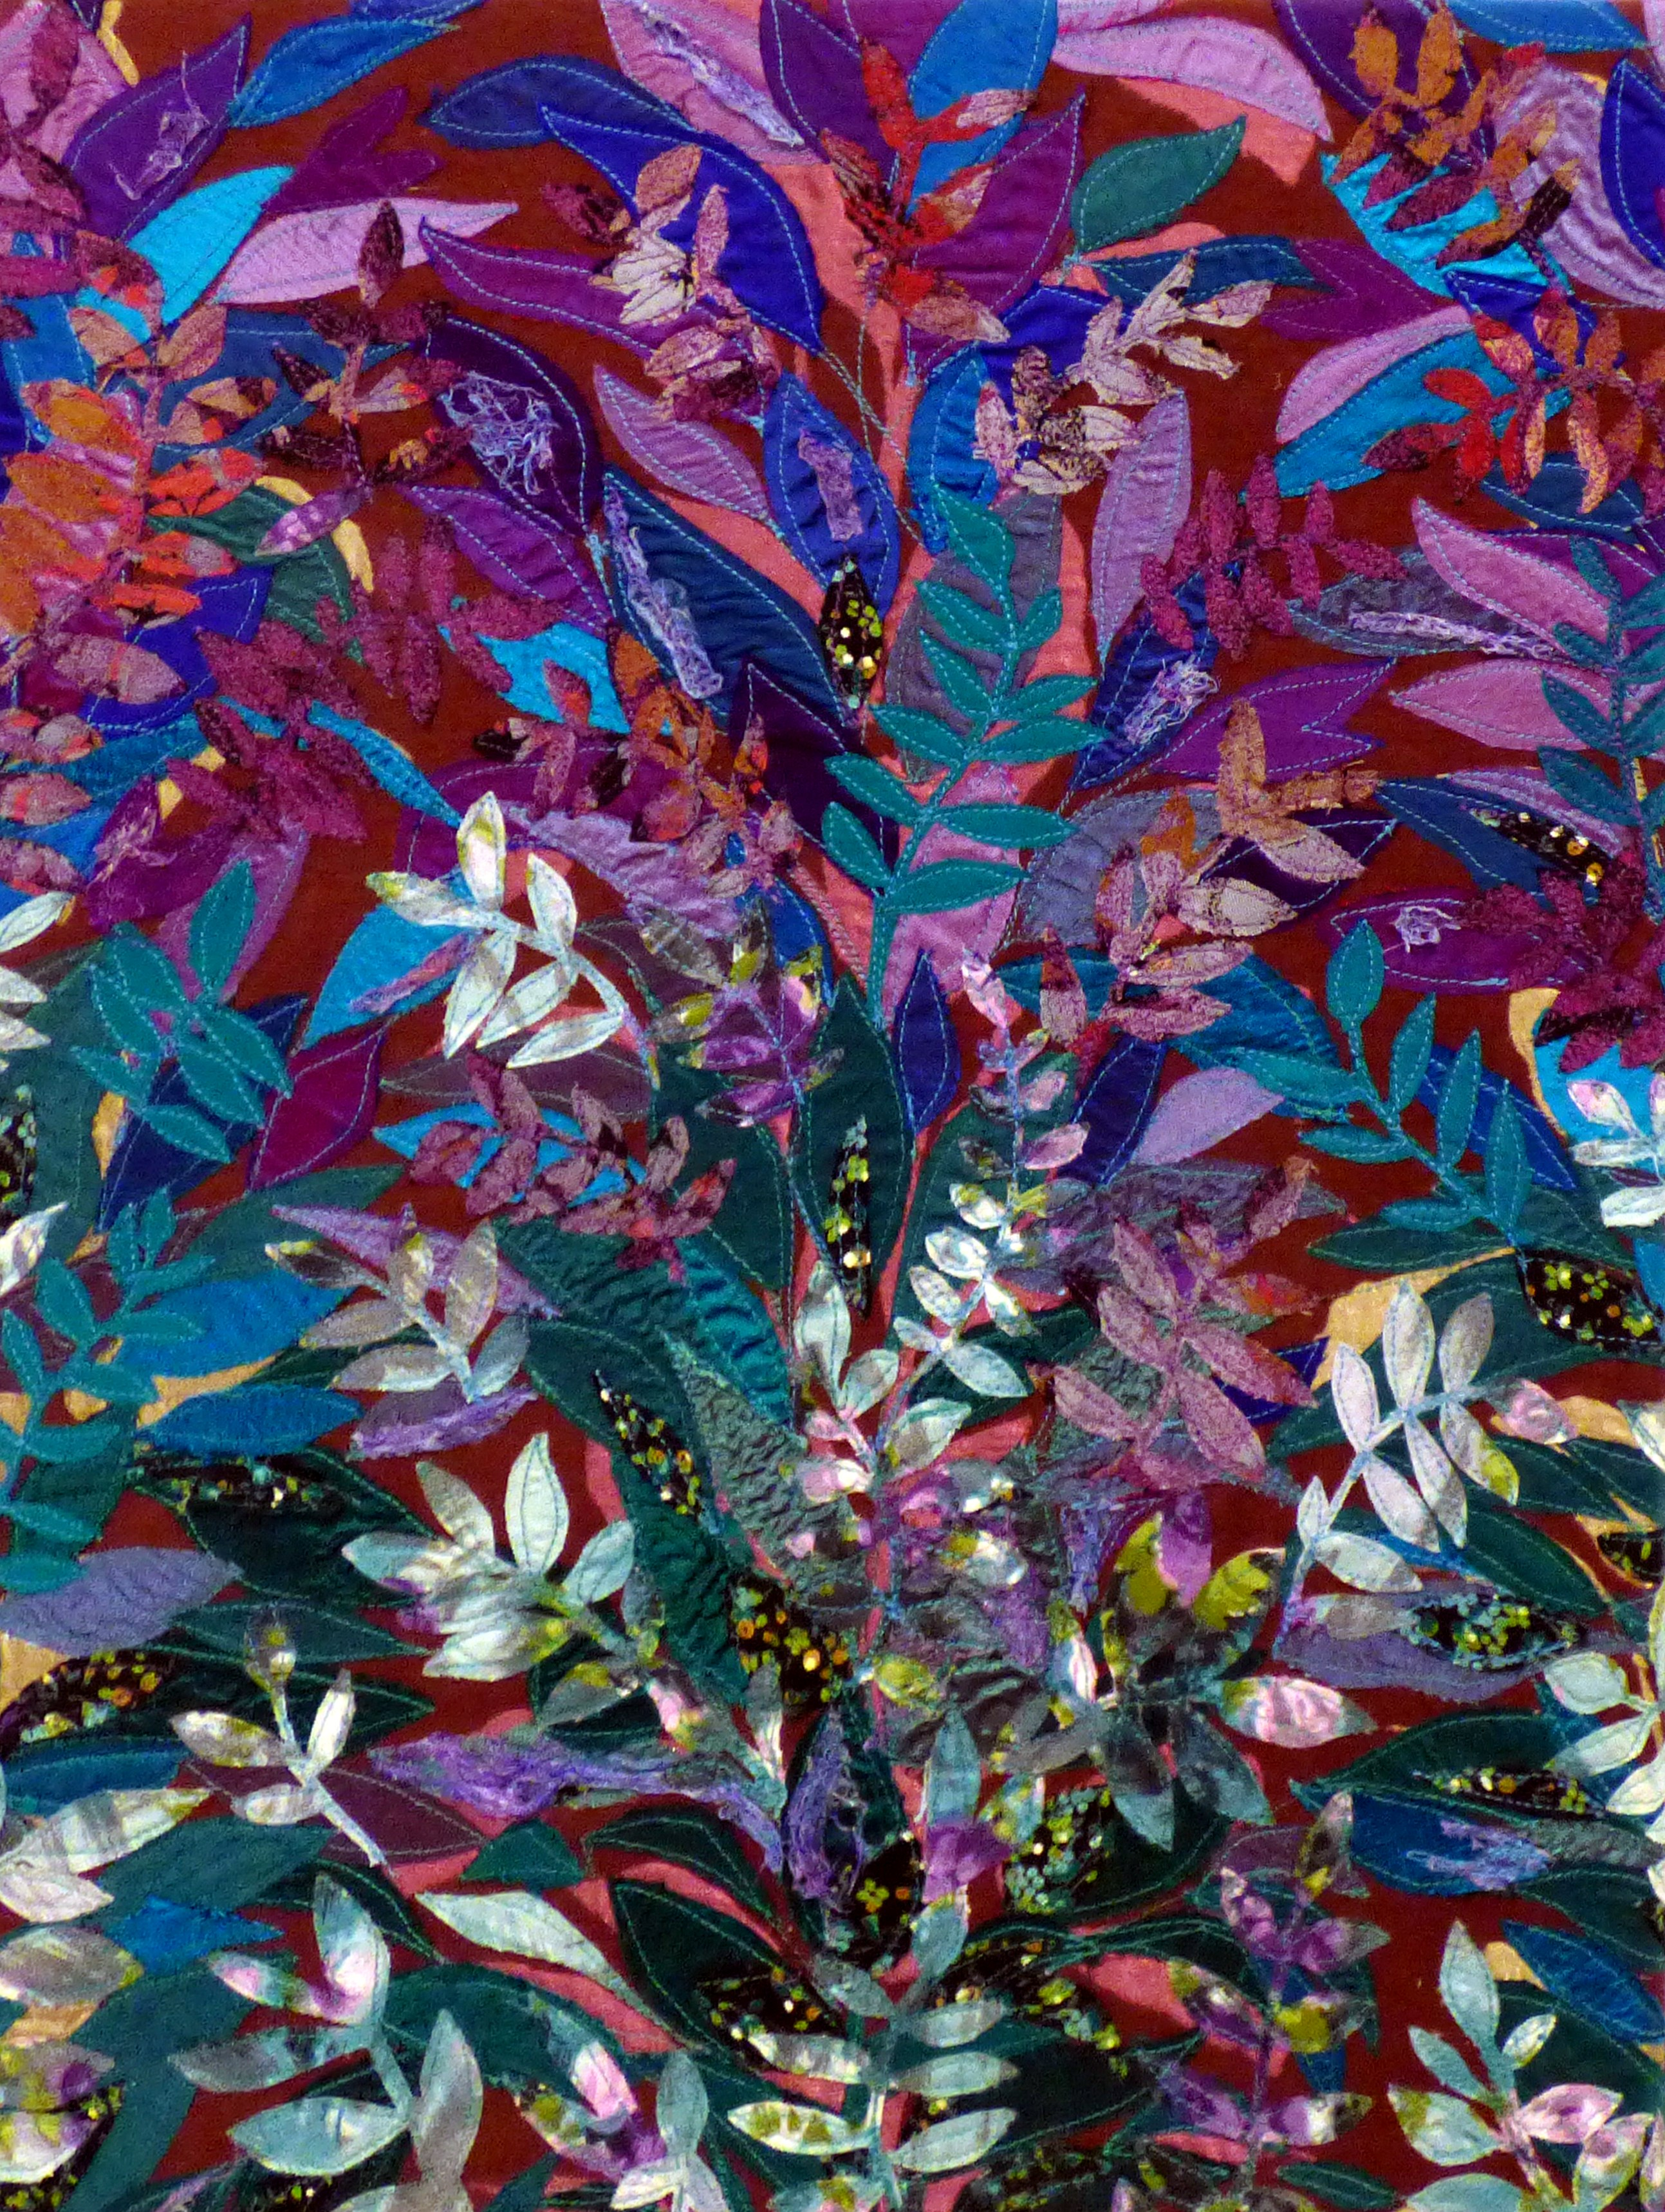 AUTUMN TWILIGHT by Lesley Crowe-Bull, Ten Plus exhibition, Nantwich